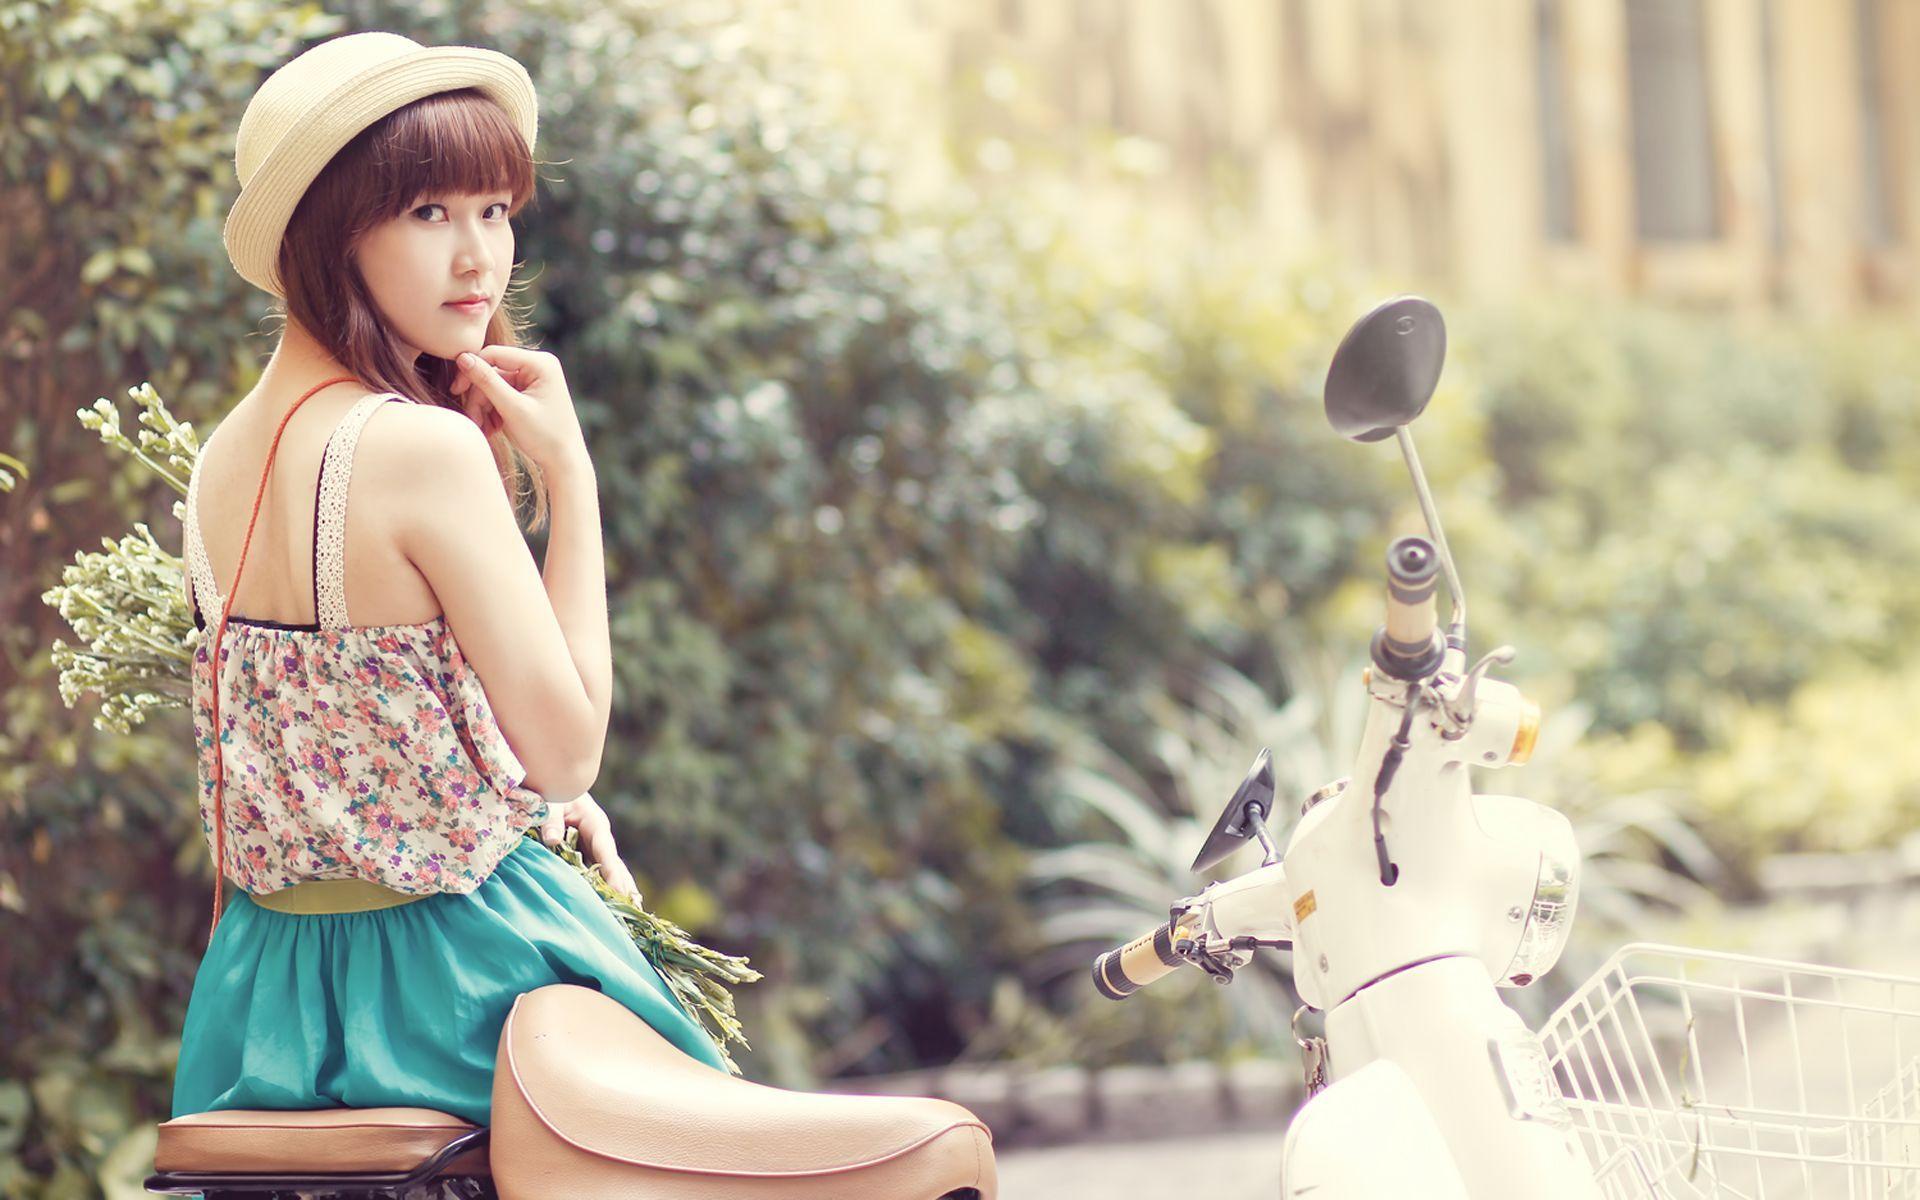 Pin On Cute And Beautiful Asian Girls Wallpapers Full Hd